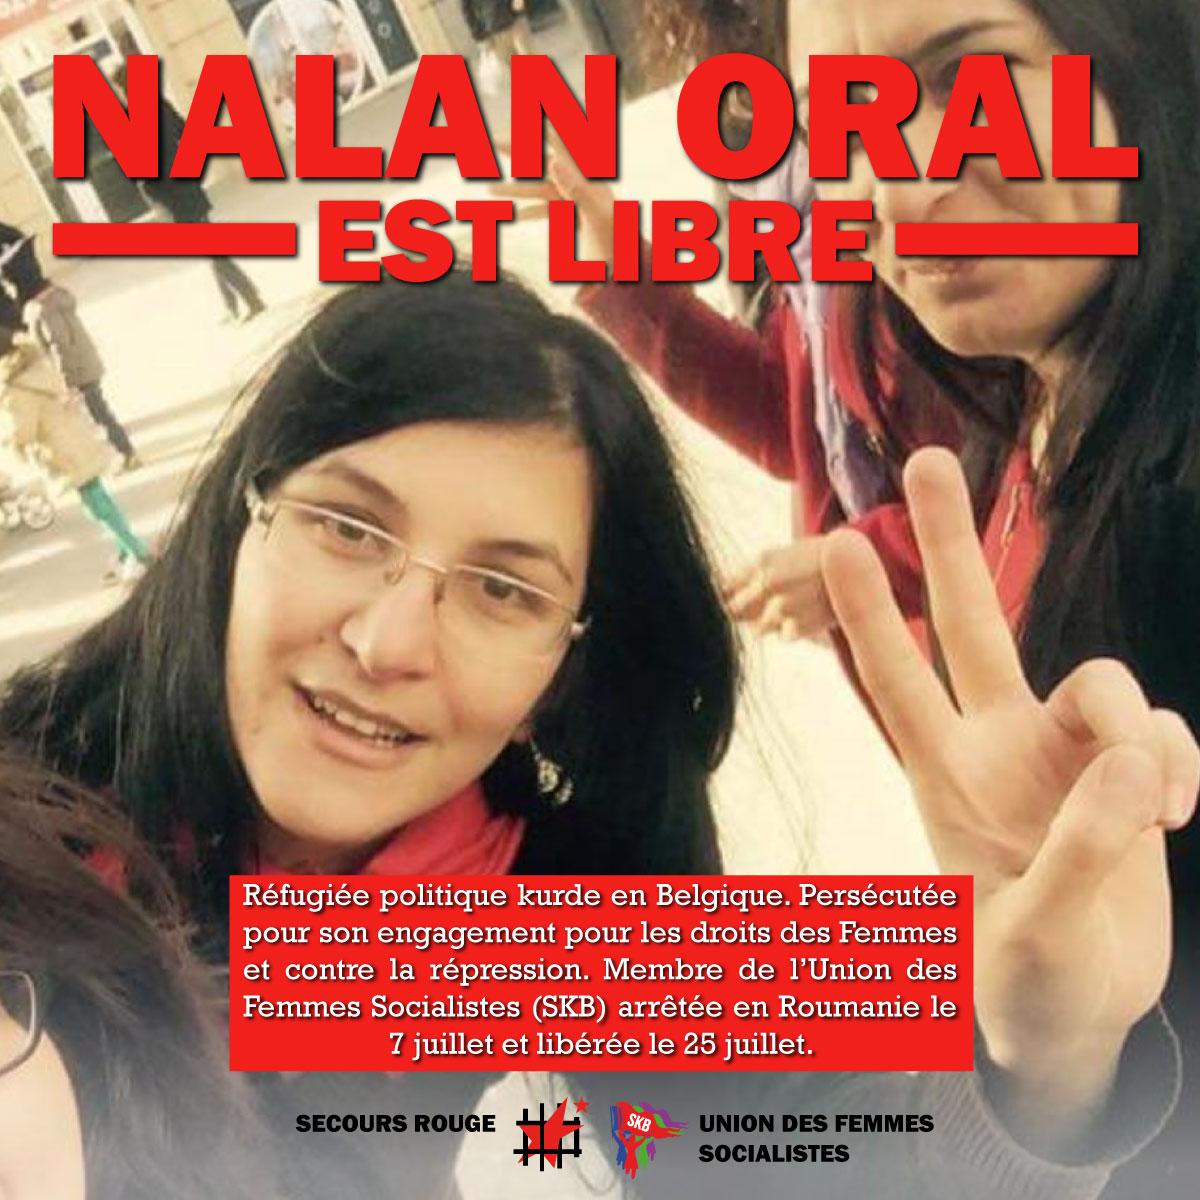 Nalan Oral a été libérée